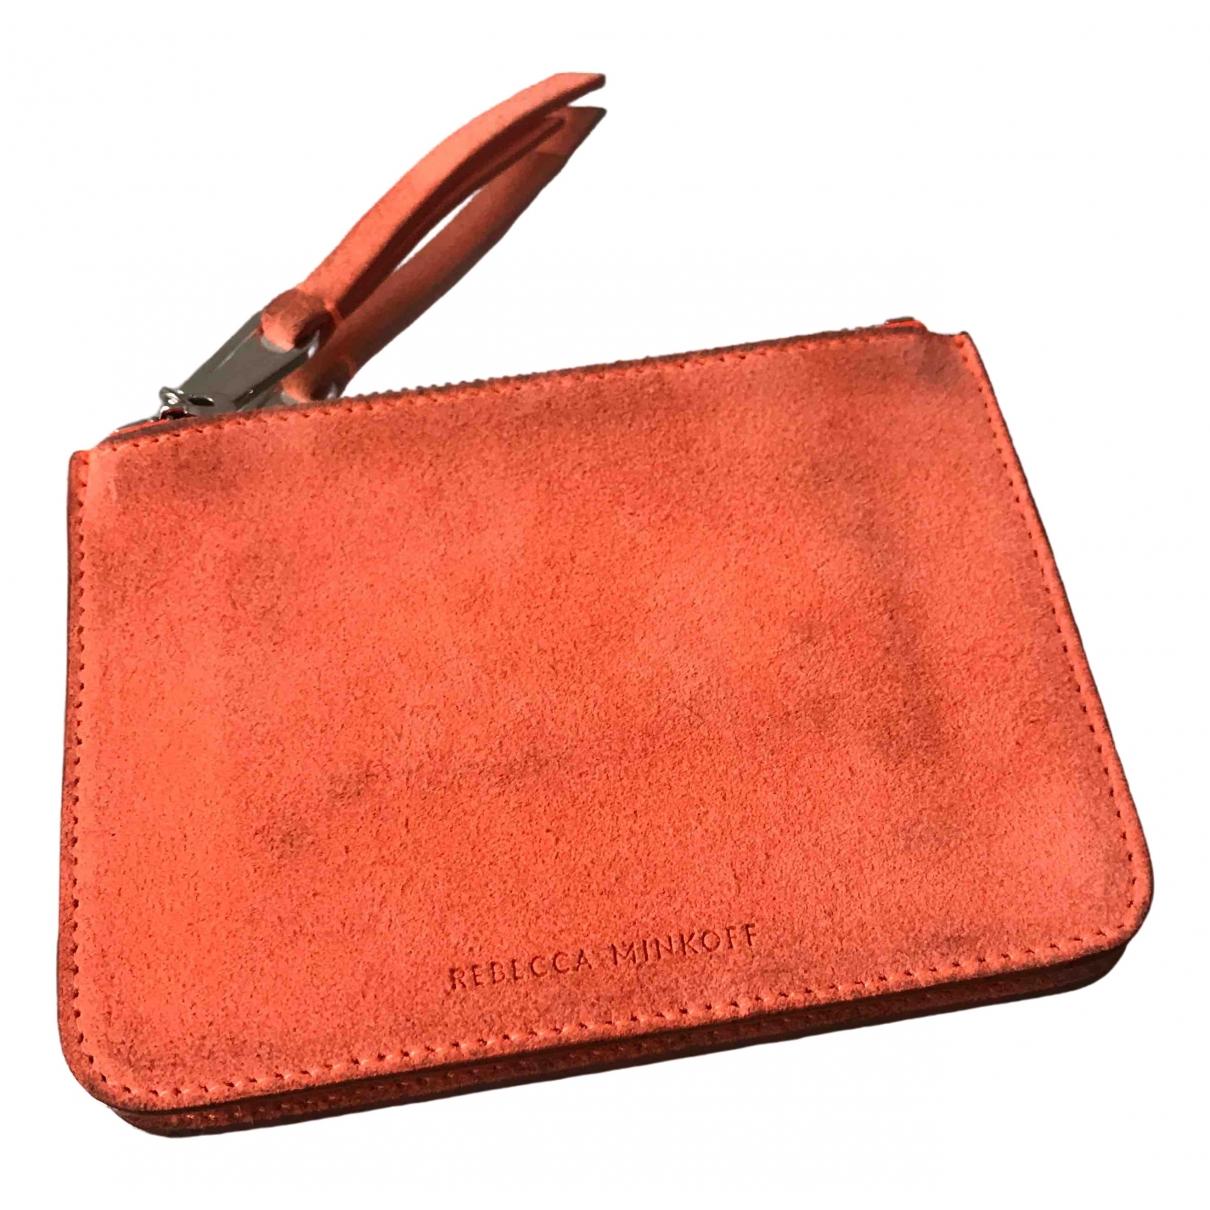 Rebecca Minkoff \N Orange Suede Purses, wallet & cases for Women \N